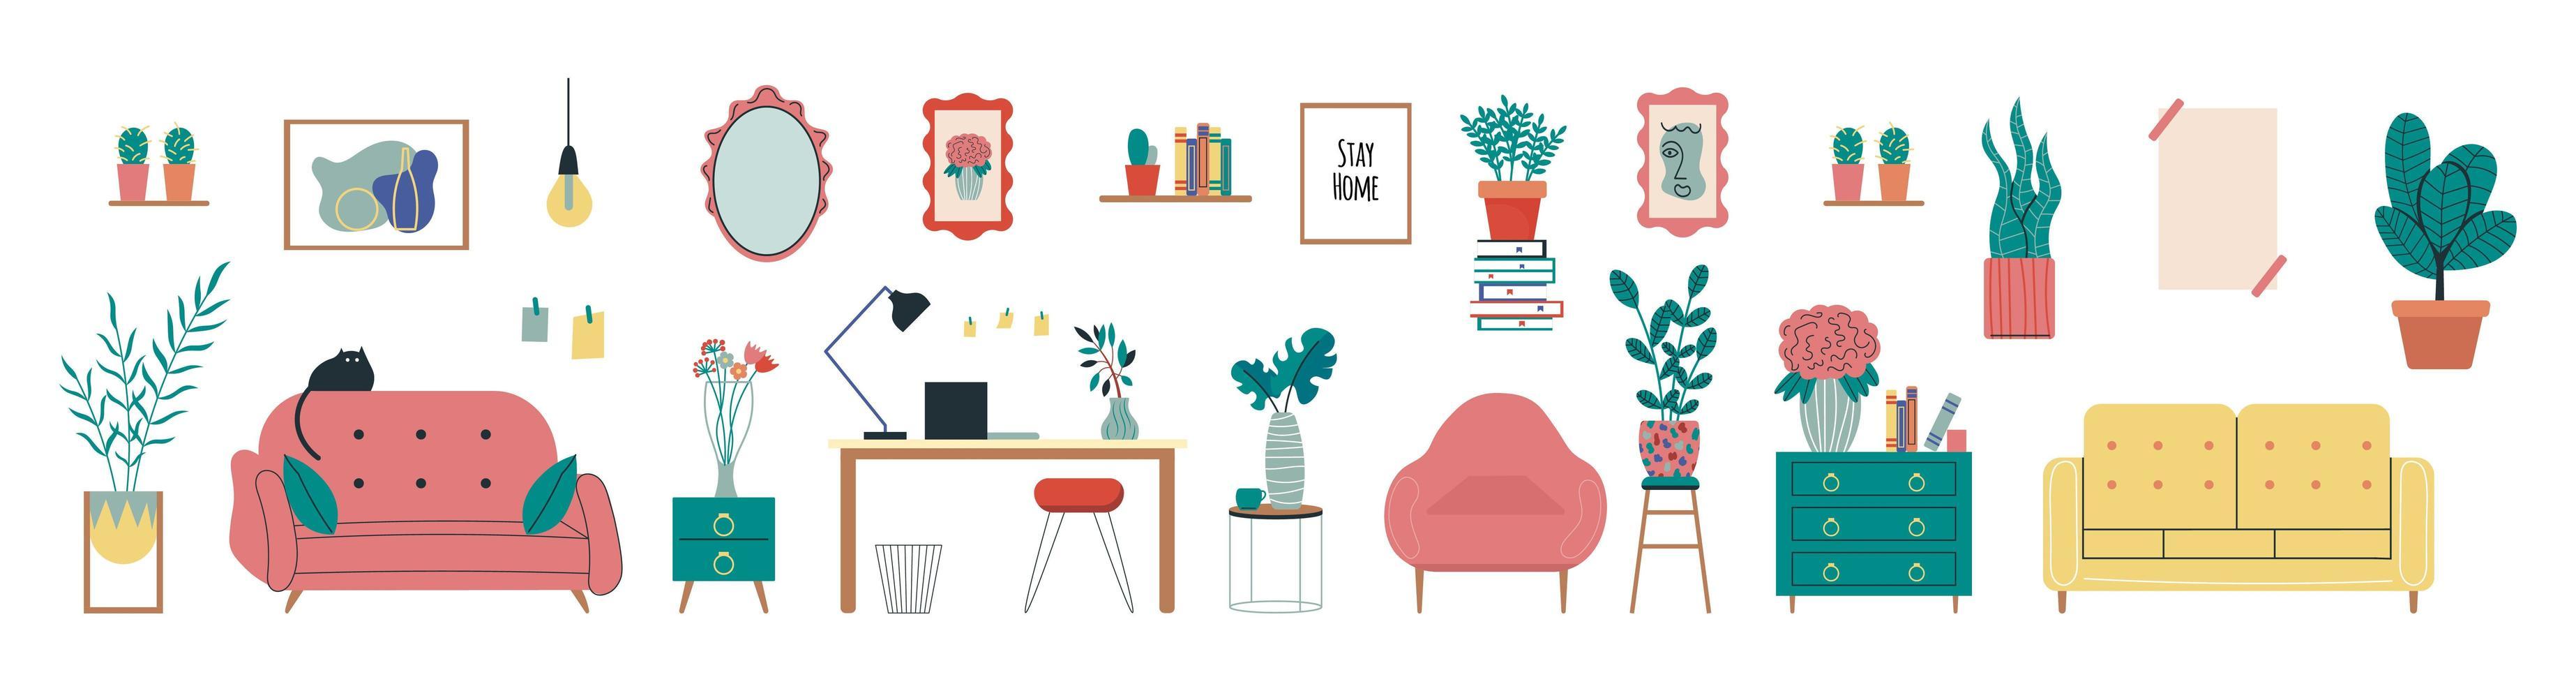 Stylish Scandic living room interior vector